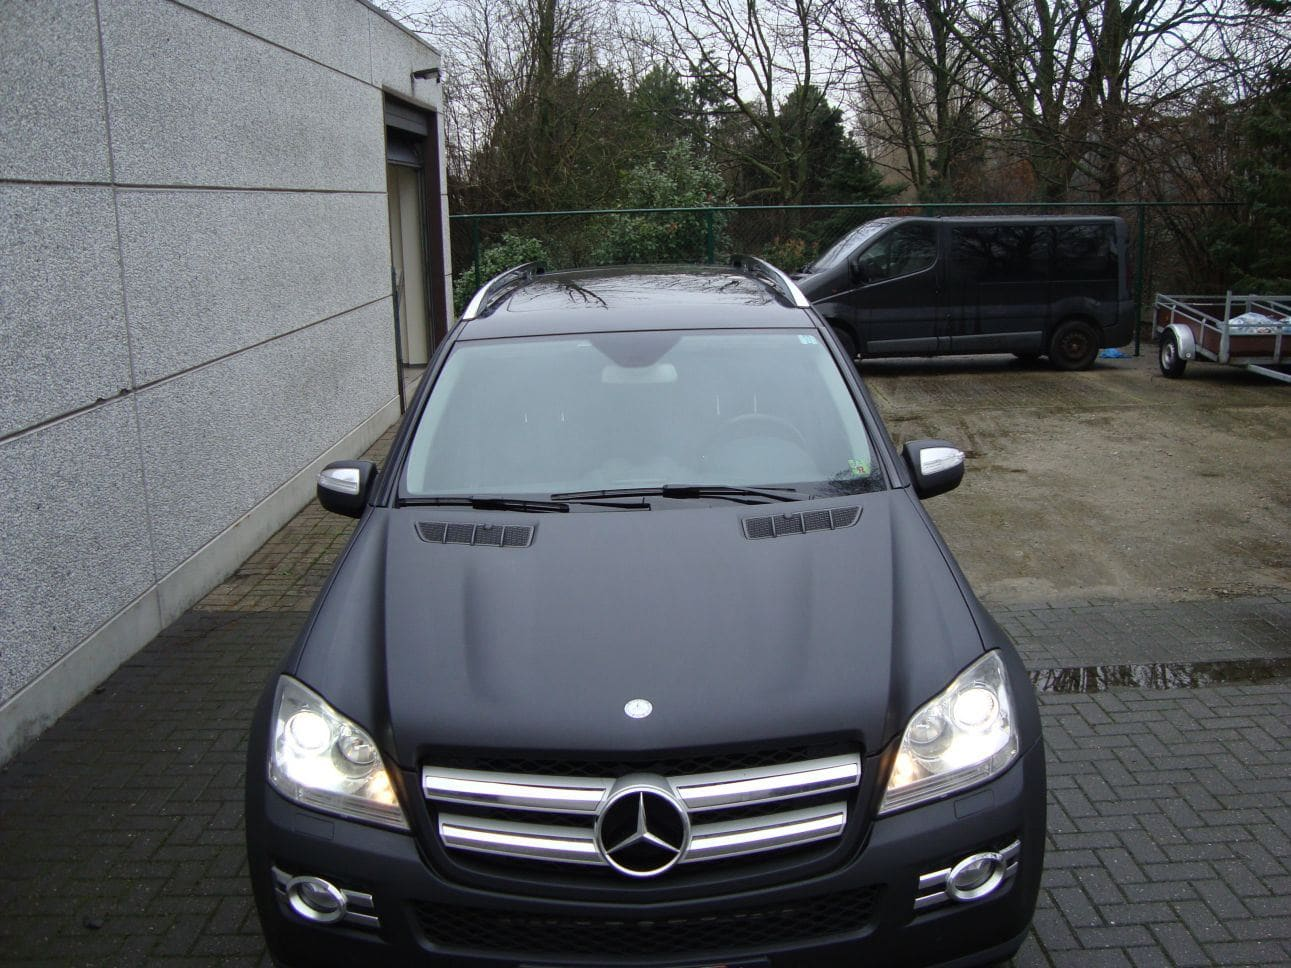 Mercedes GL met Mat Zwarte Wrap, Carwrapping door Wrapmyride.nu Foto-nr:6292, ©2021